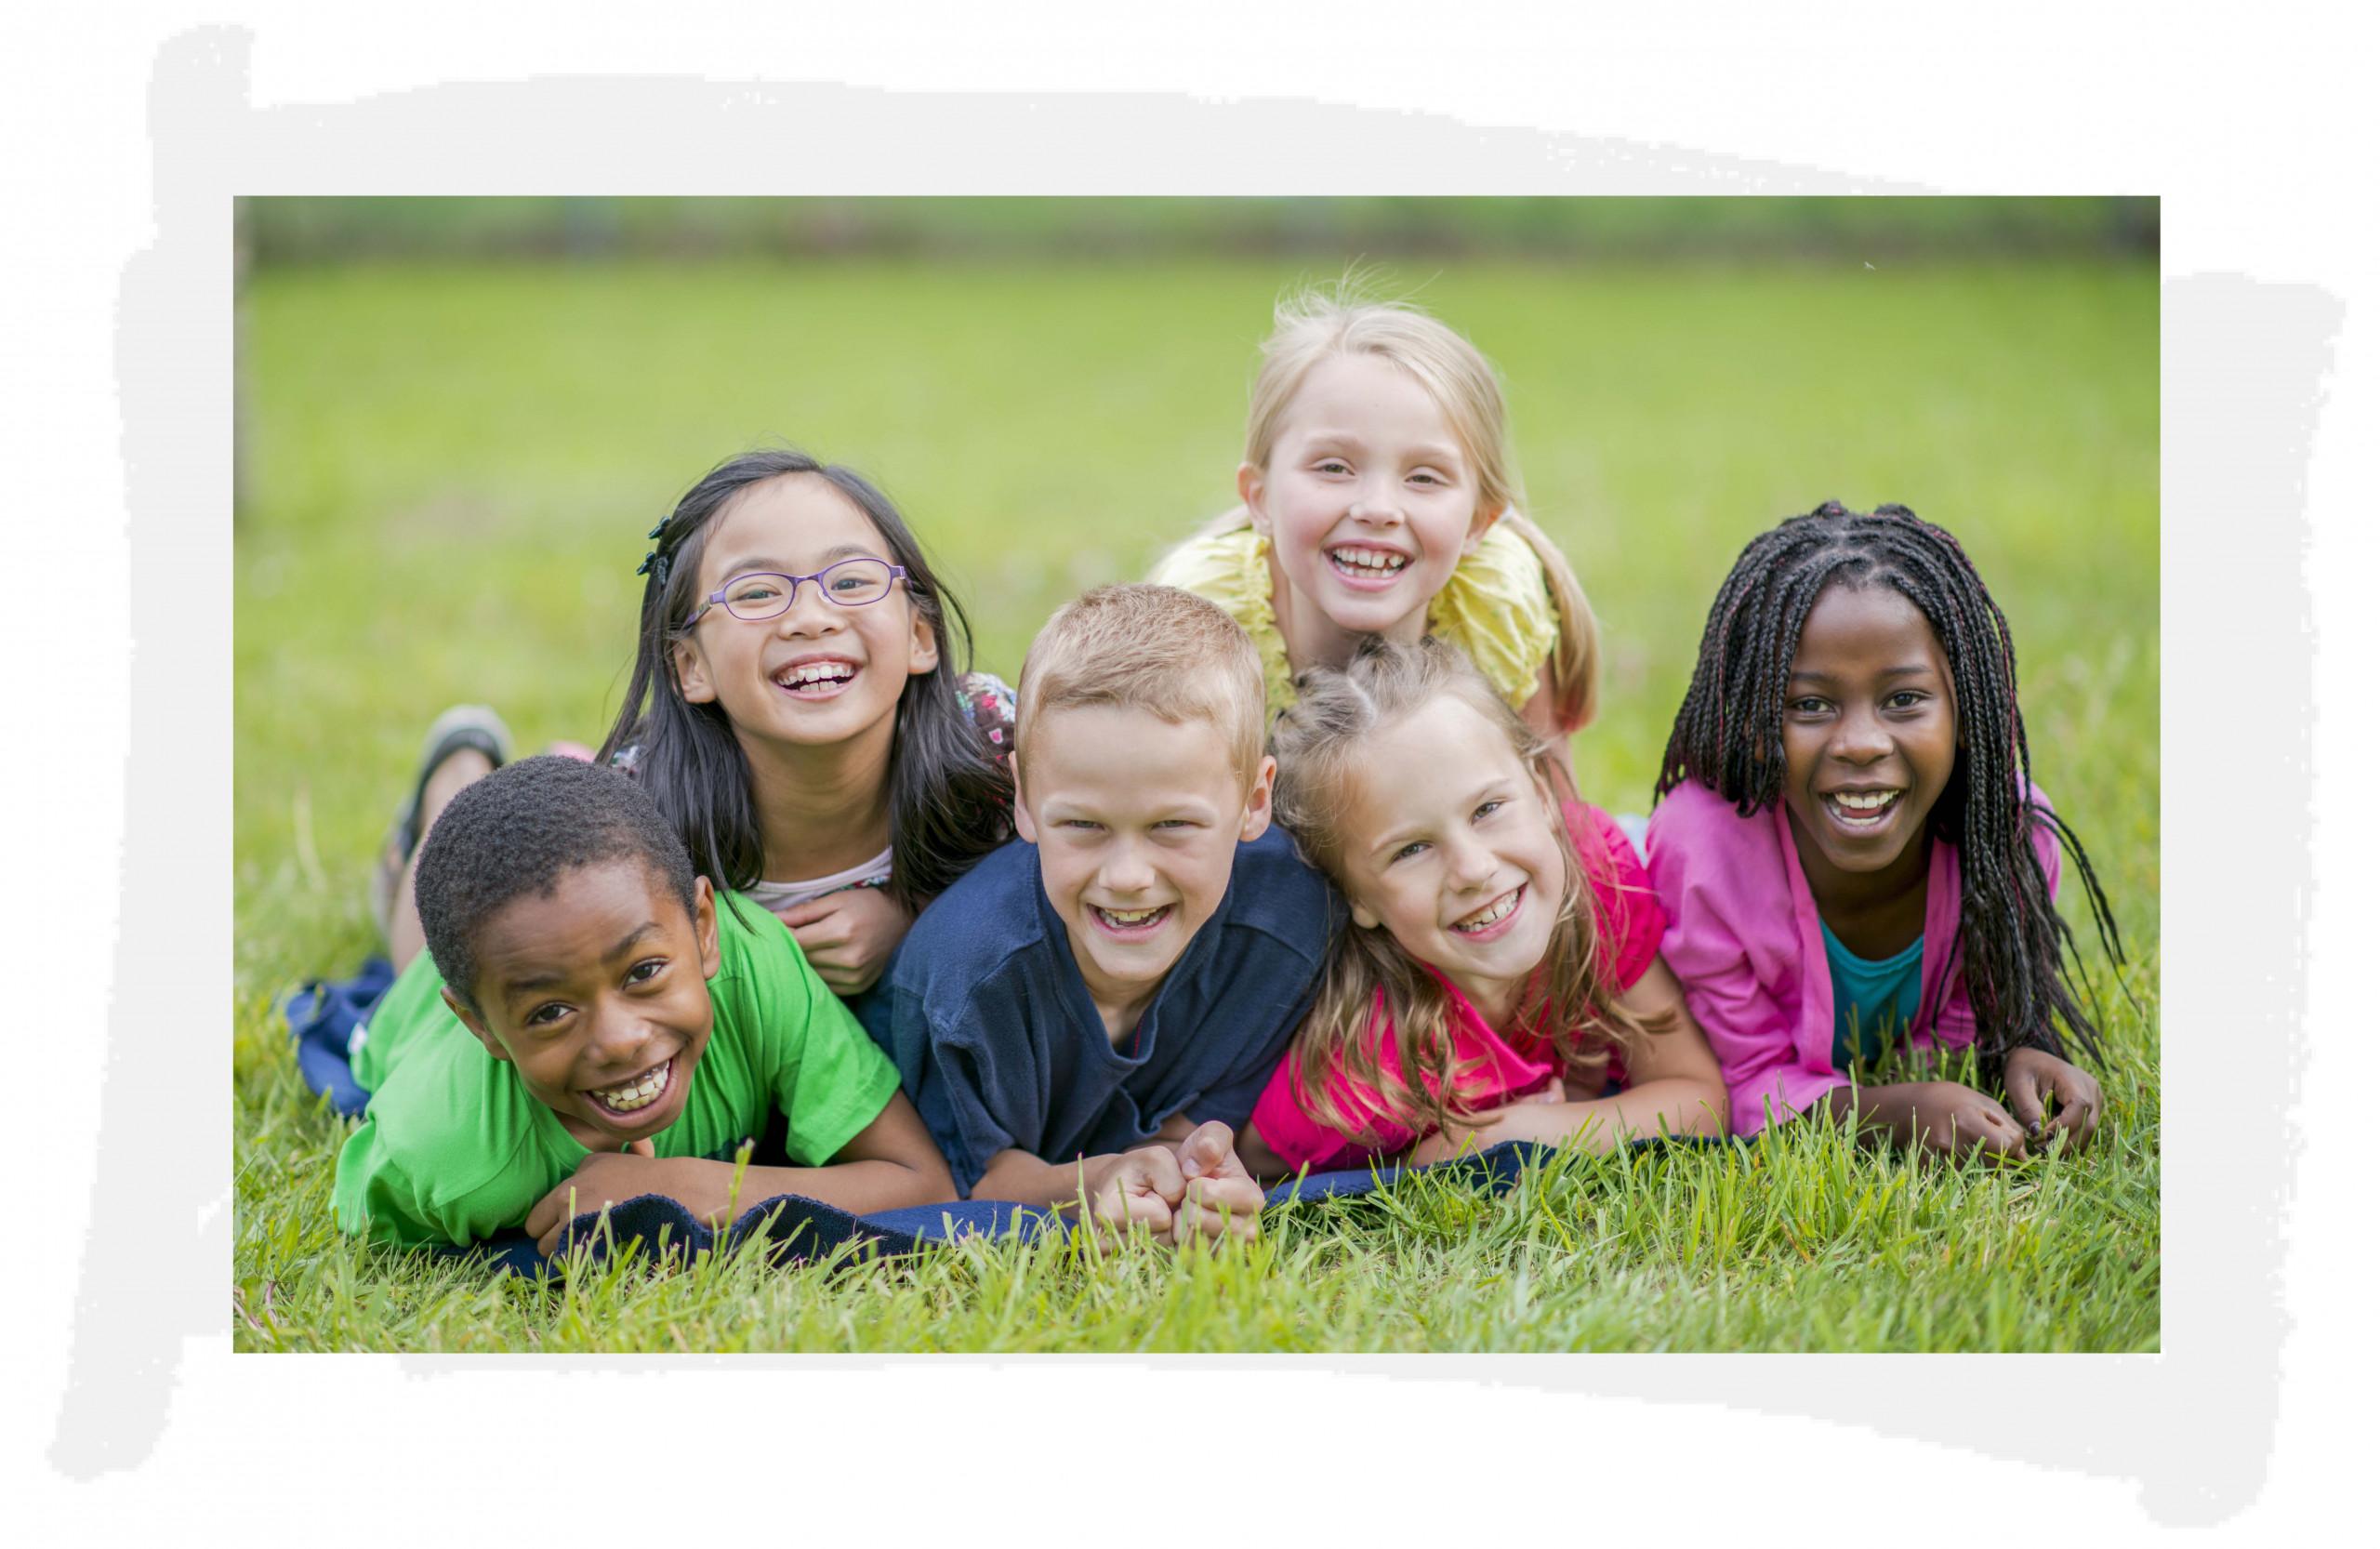 happy children smiling outside